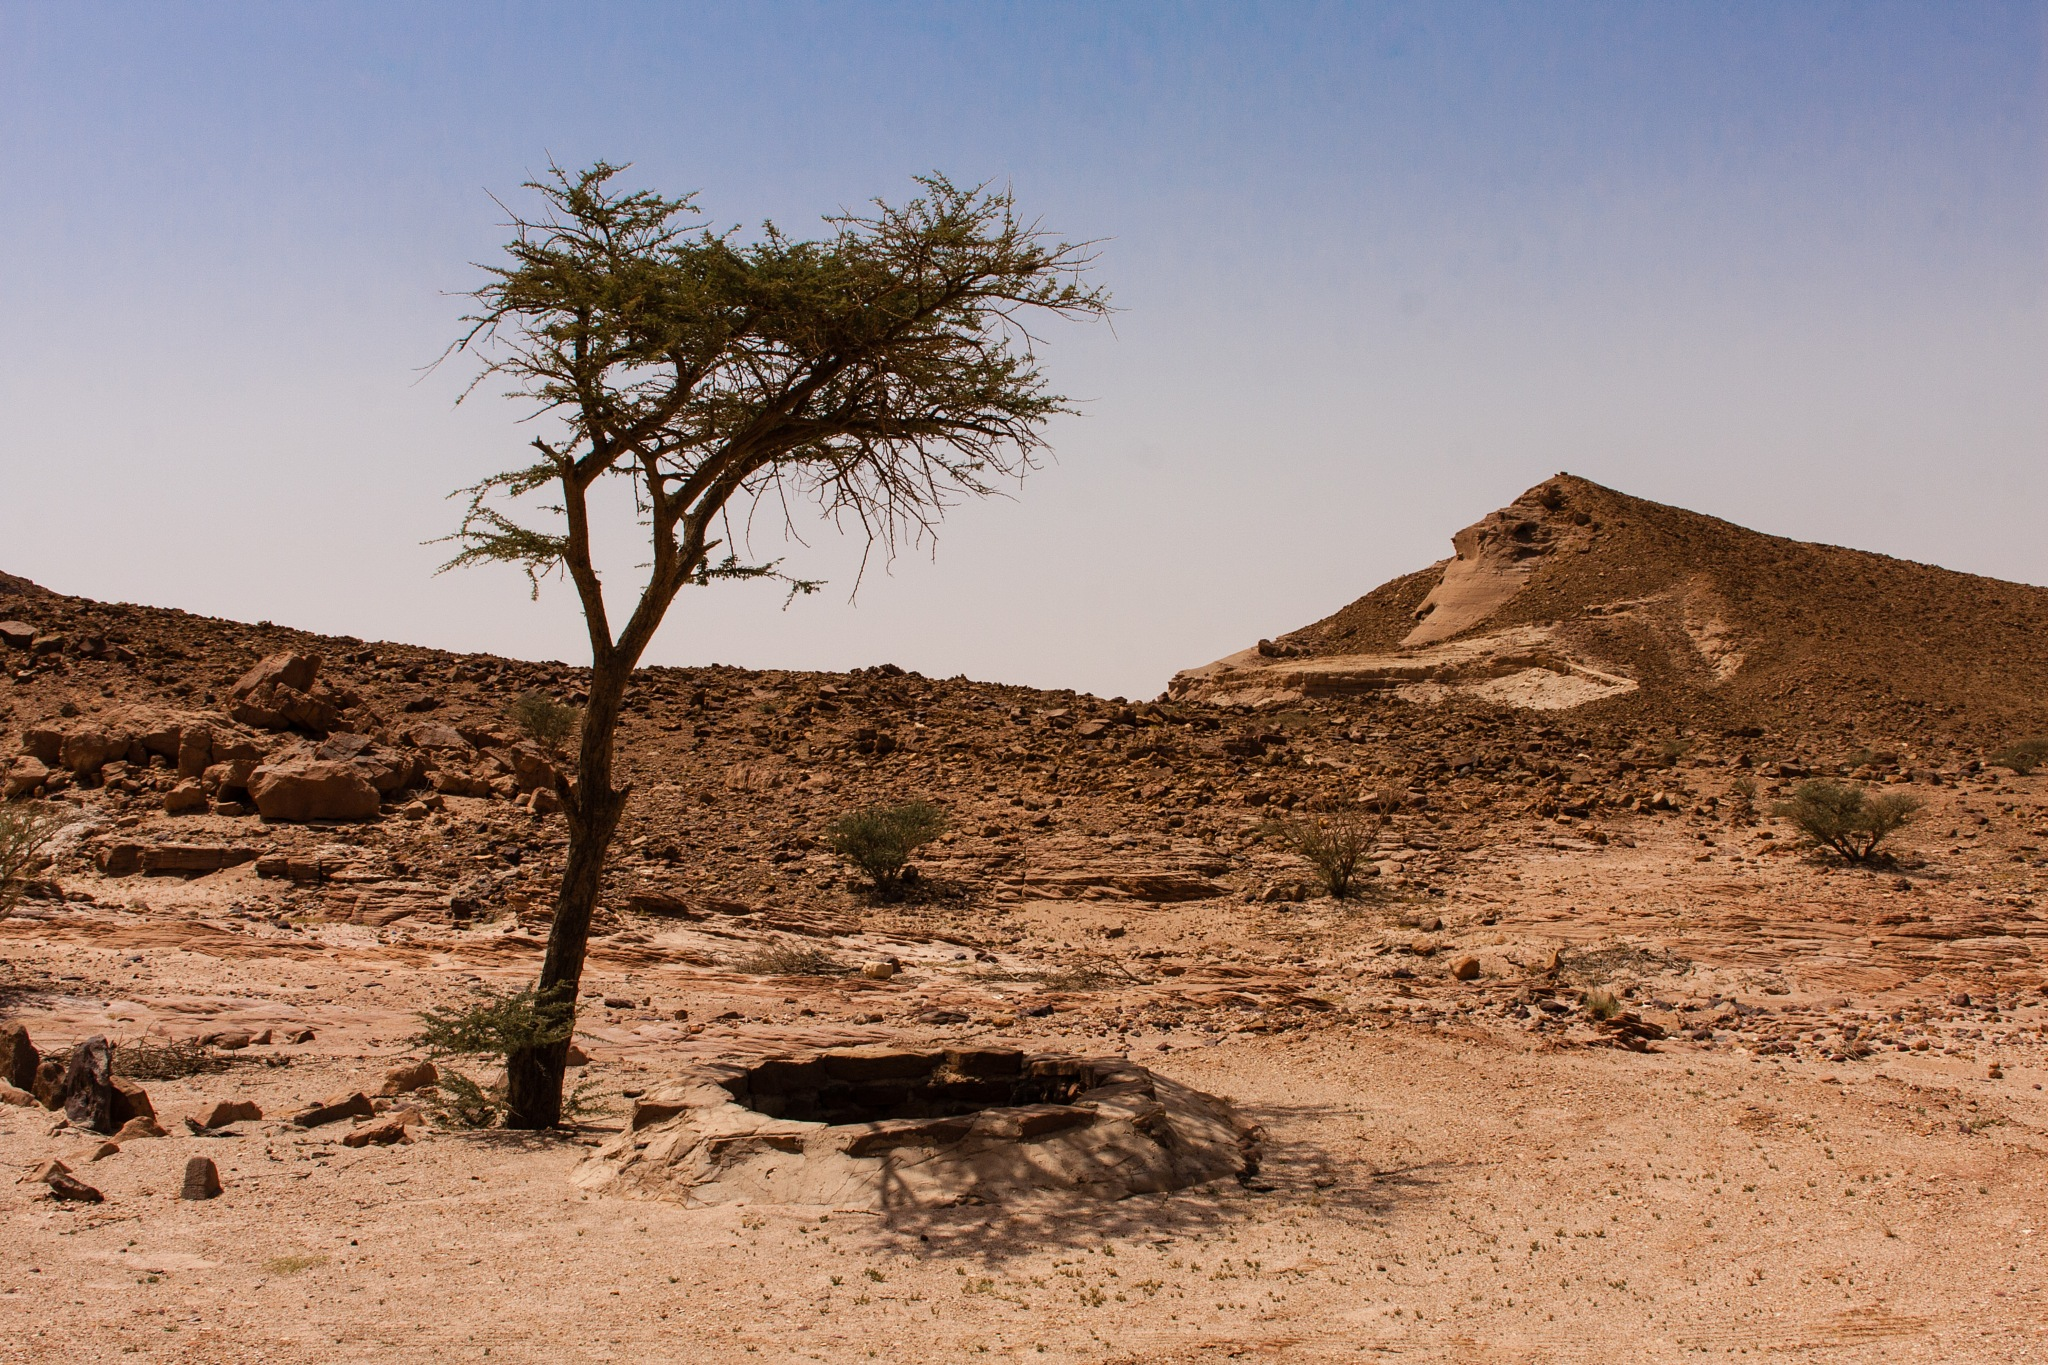 A Desert Well by Volodymyr Dvornyk